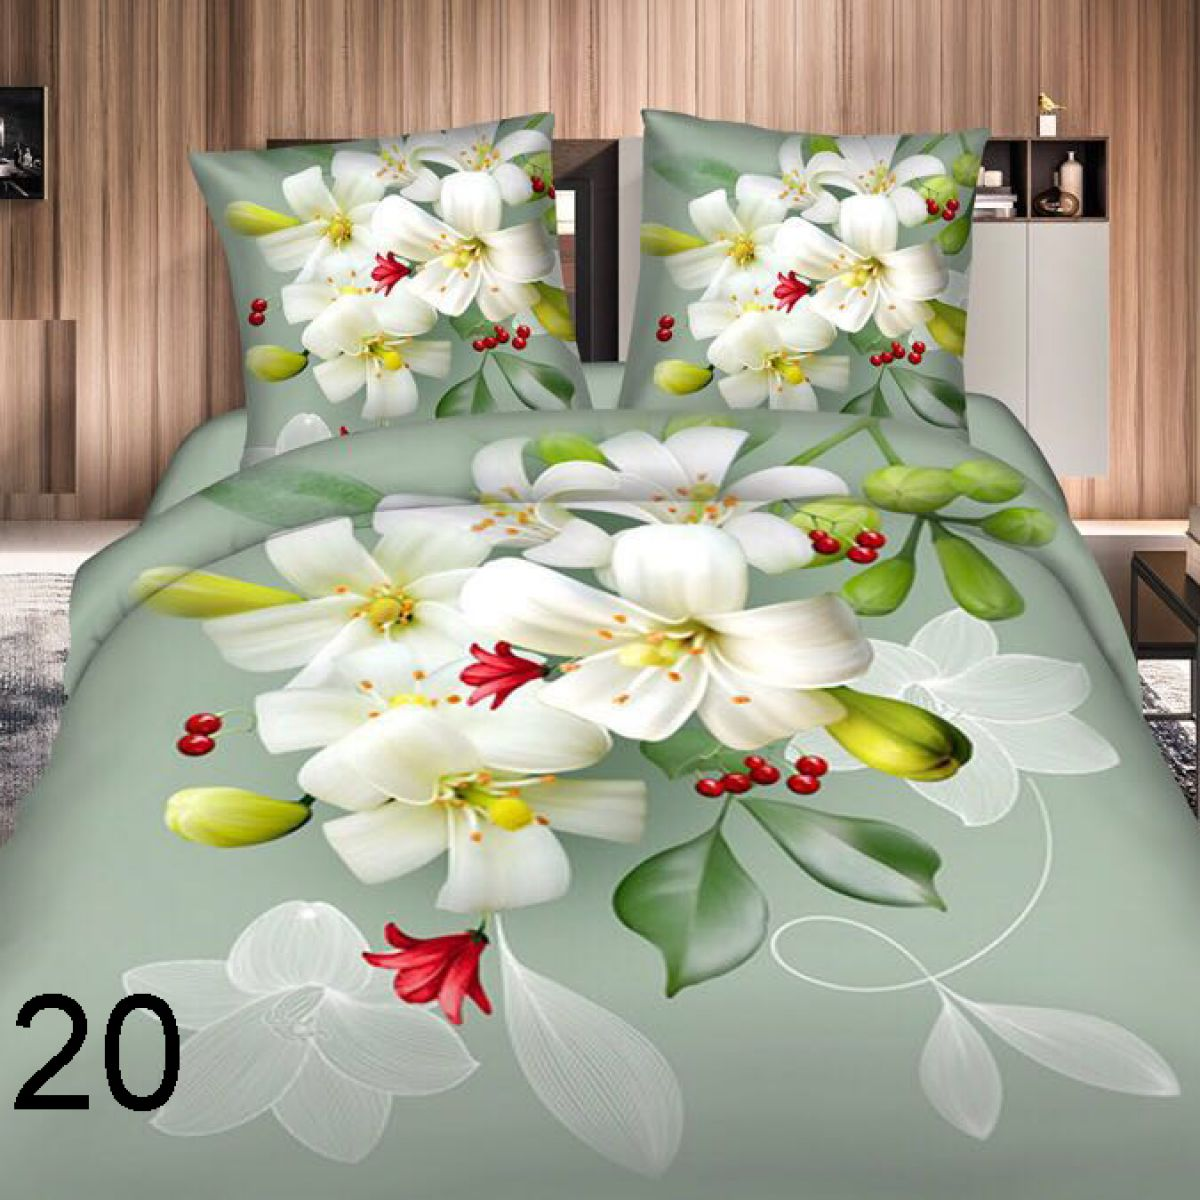 3D Beddings - Antonio - AML-20 - 160x200 cm - 4 pcs